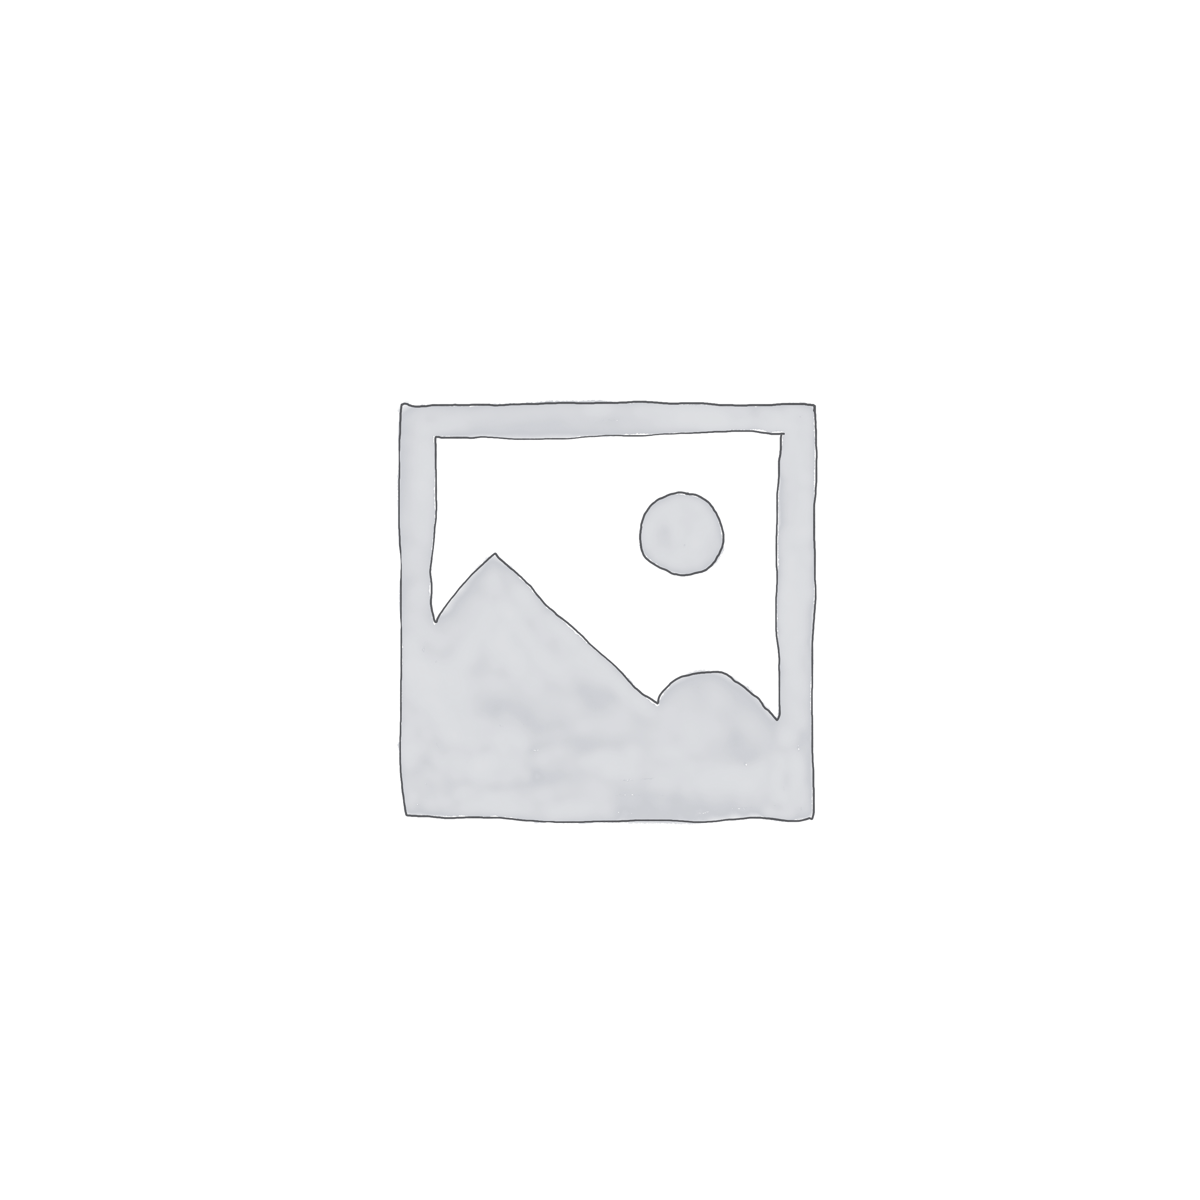 Sierra Circular CS1024 Black&Decker